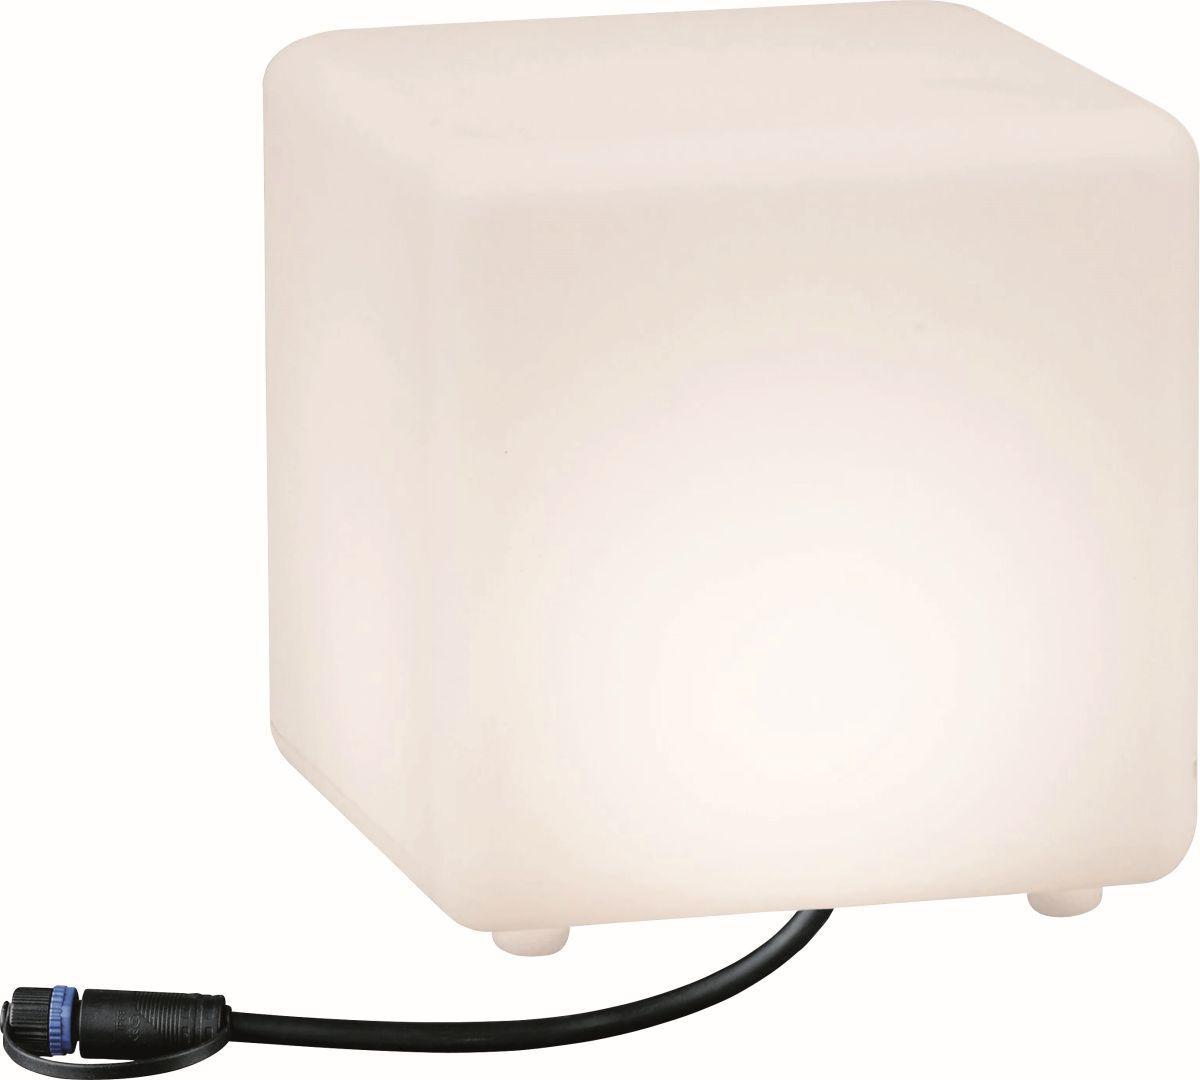 6781691_bodove-osvetleni-paulmann_plug-and-shin-cube-kopie.jpg